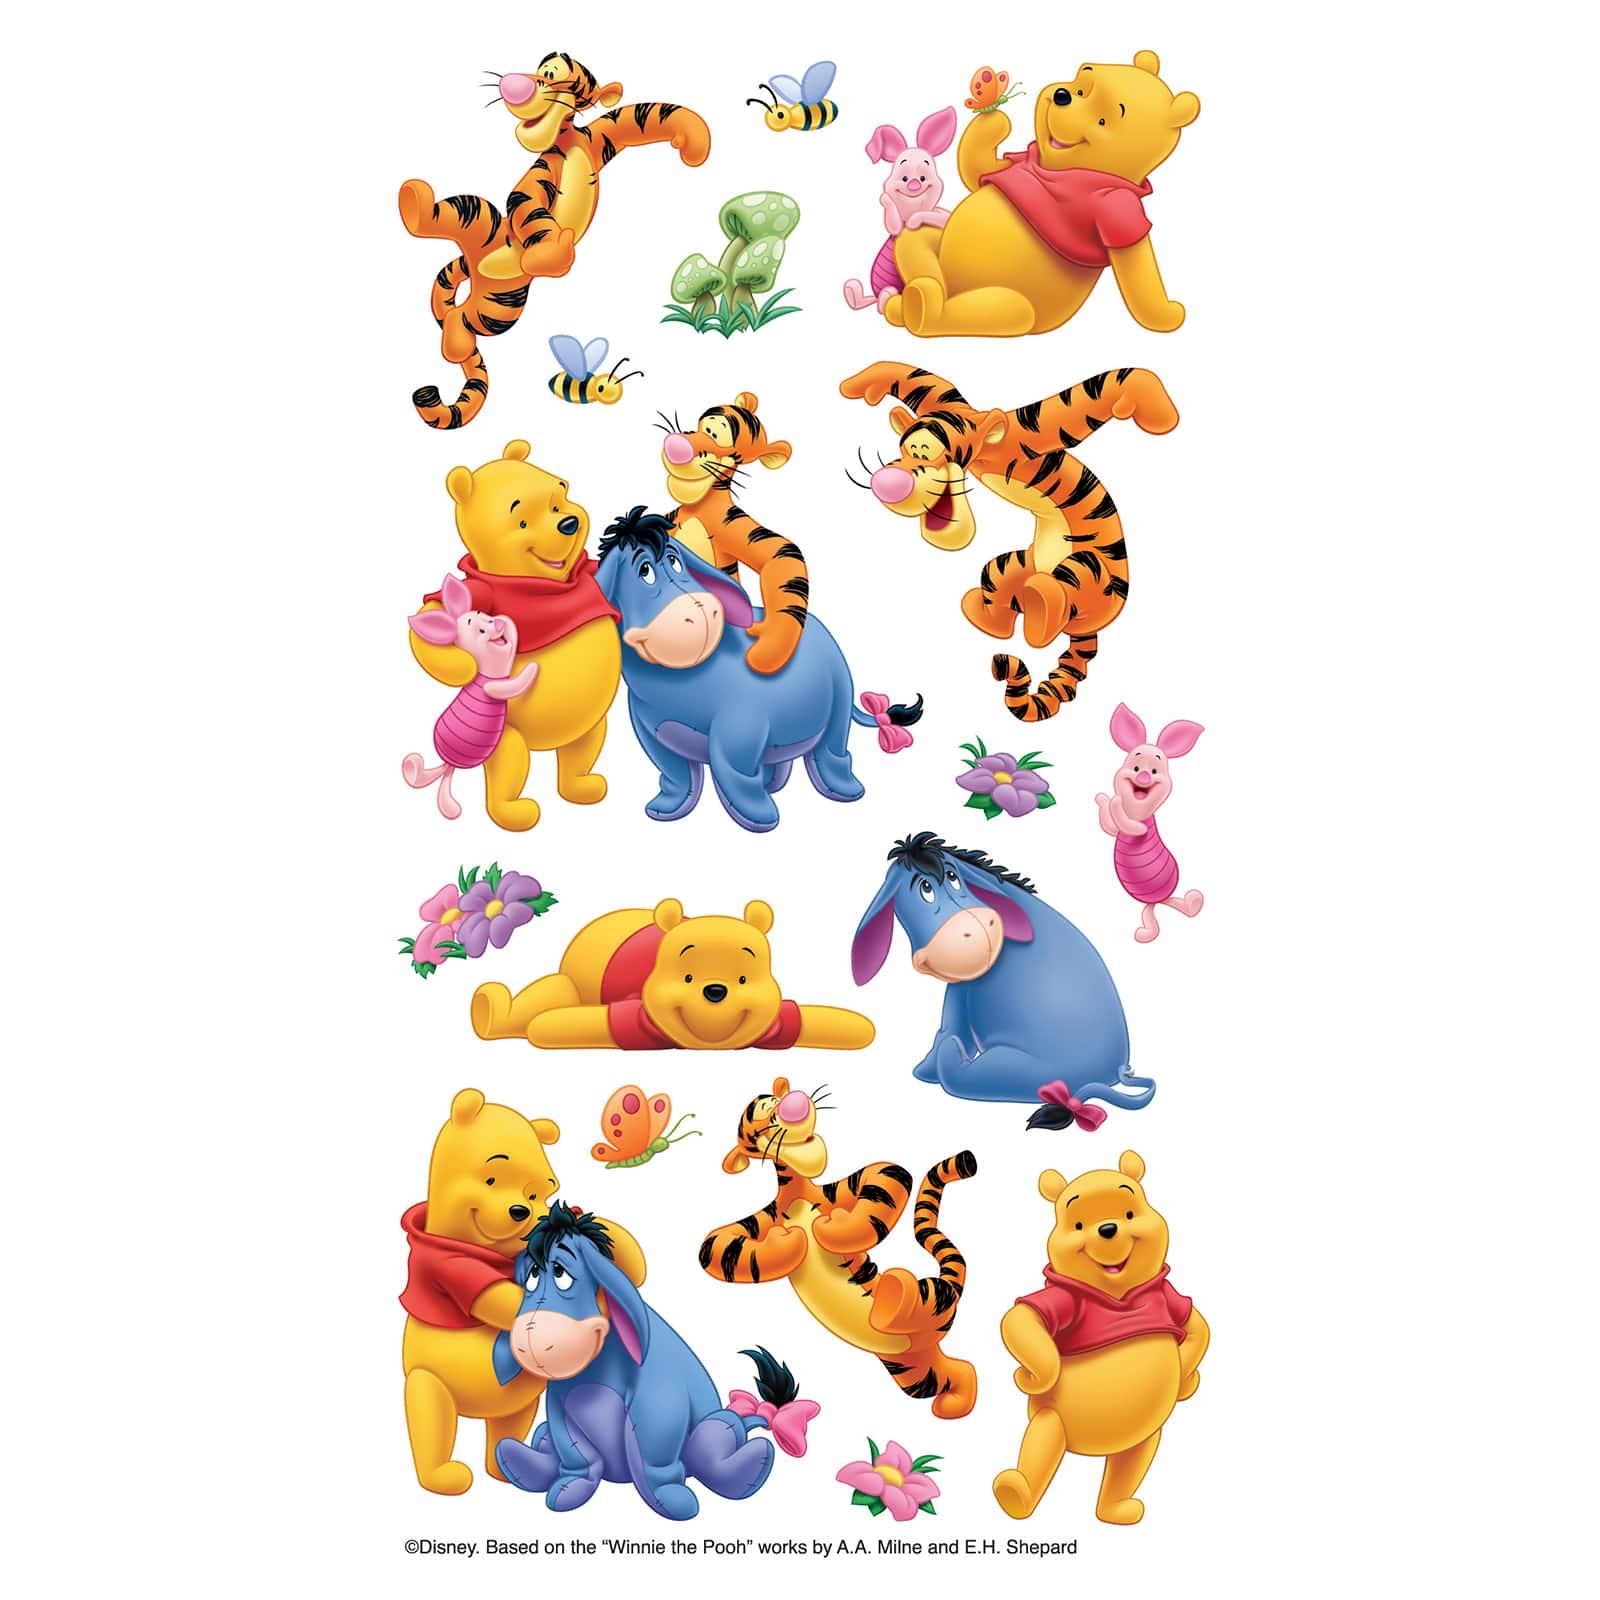 Disney Winnie The Pooh Kids CANVAS Print Handmade Ready To Hang WALL ART Framed Print